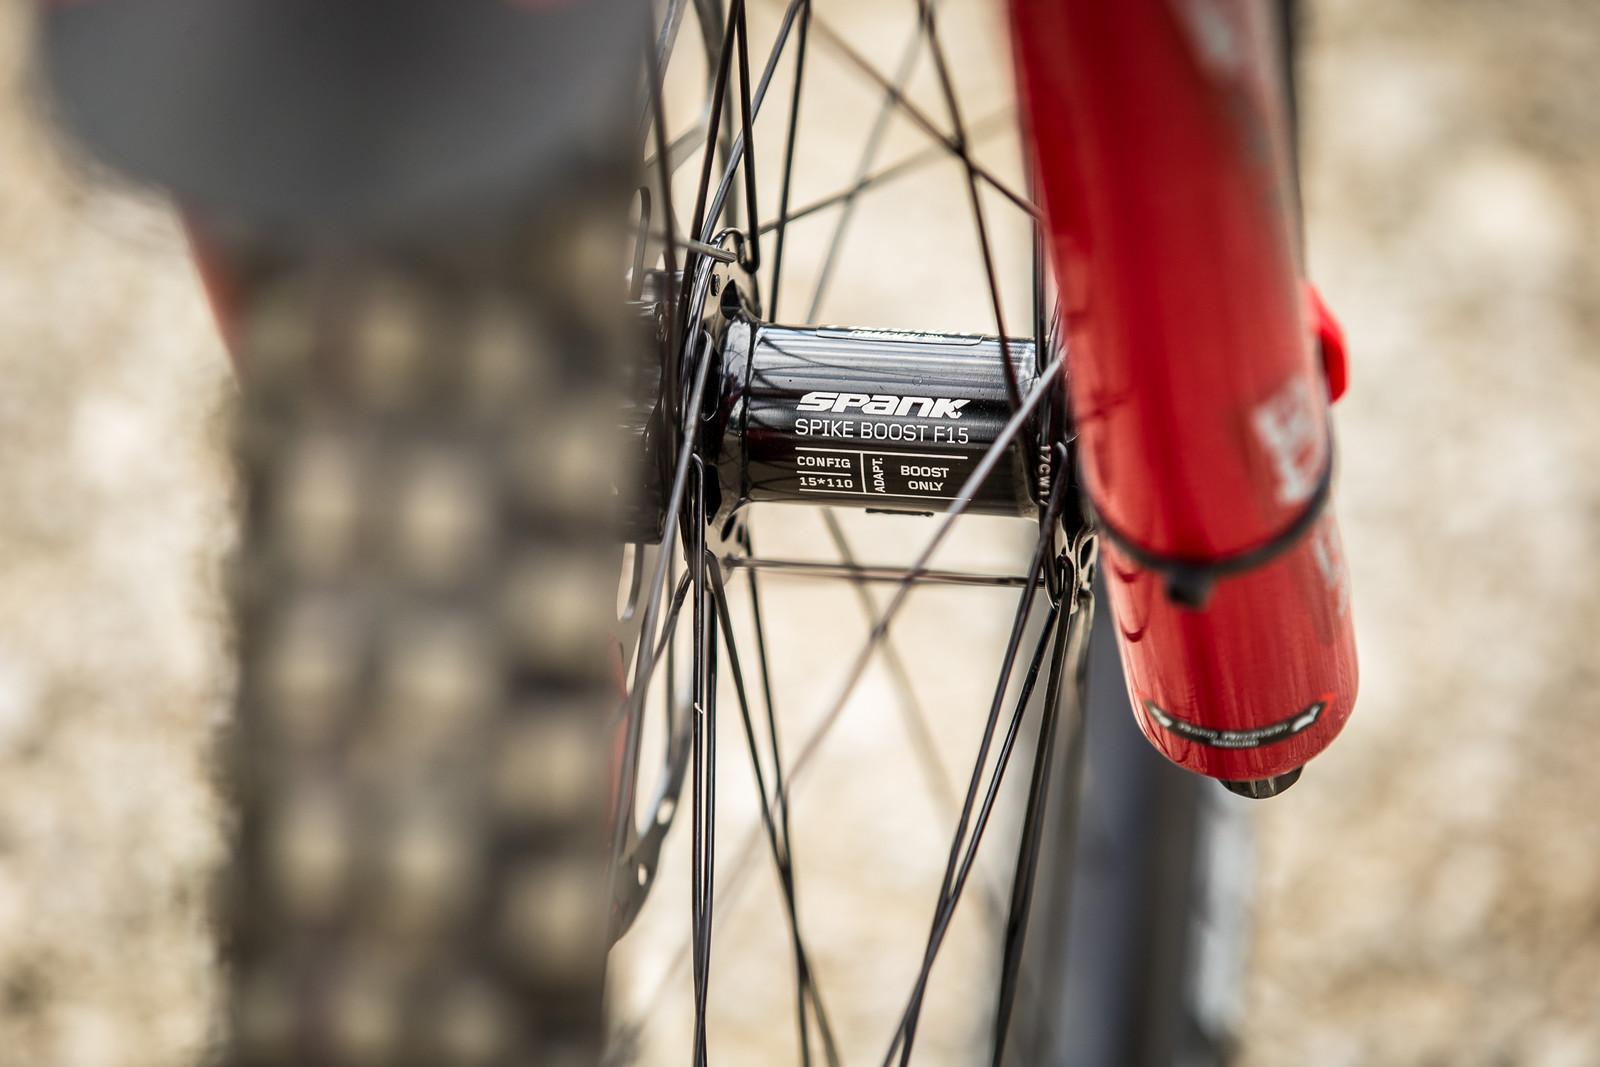 Spank Wheels - WINNING BIKE - Amaury Pierron's Commencal Supreme DH 29 - Mountain Biking Pictures - Vital MTB